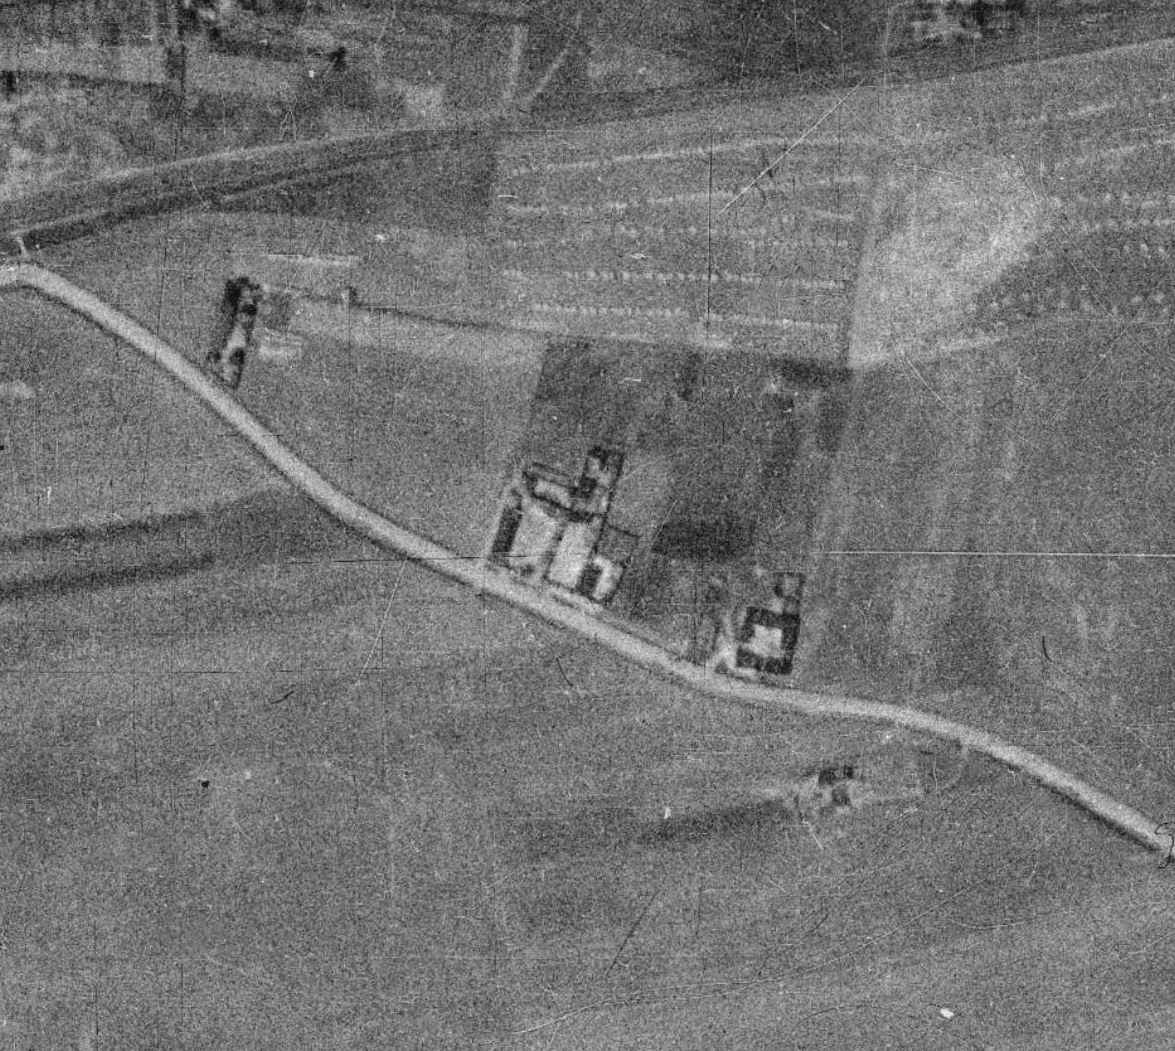 nouzova-kolonie-k-vackovu-letecky-snimek-1938